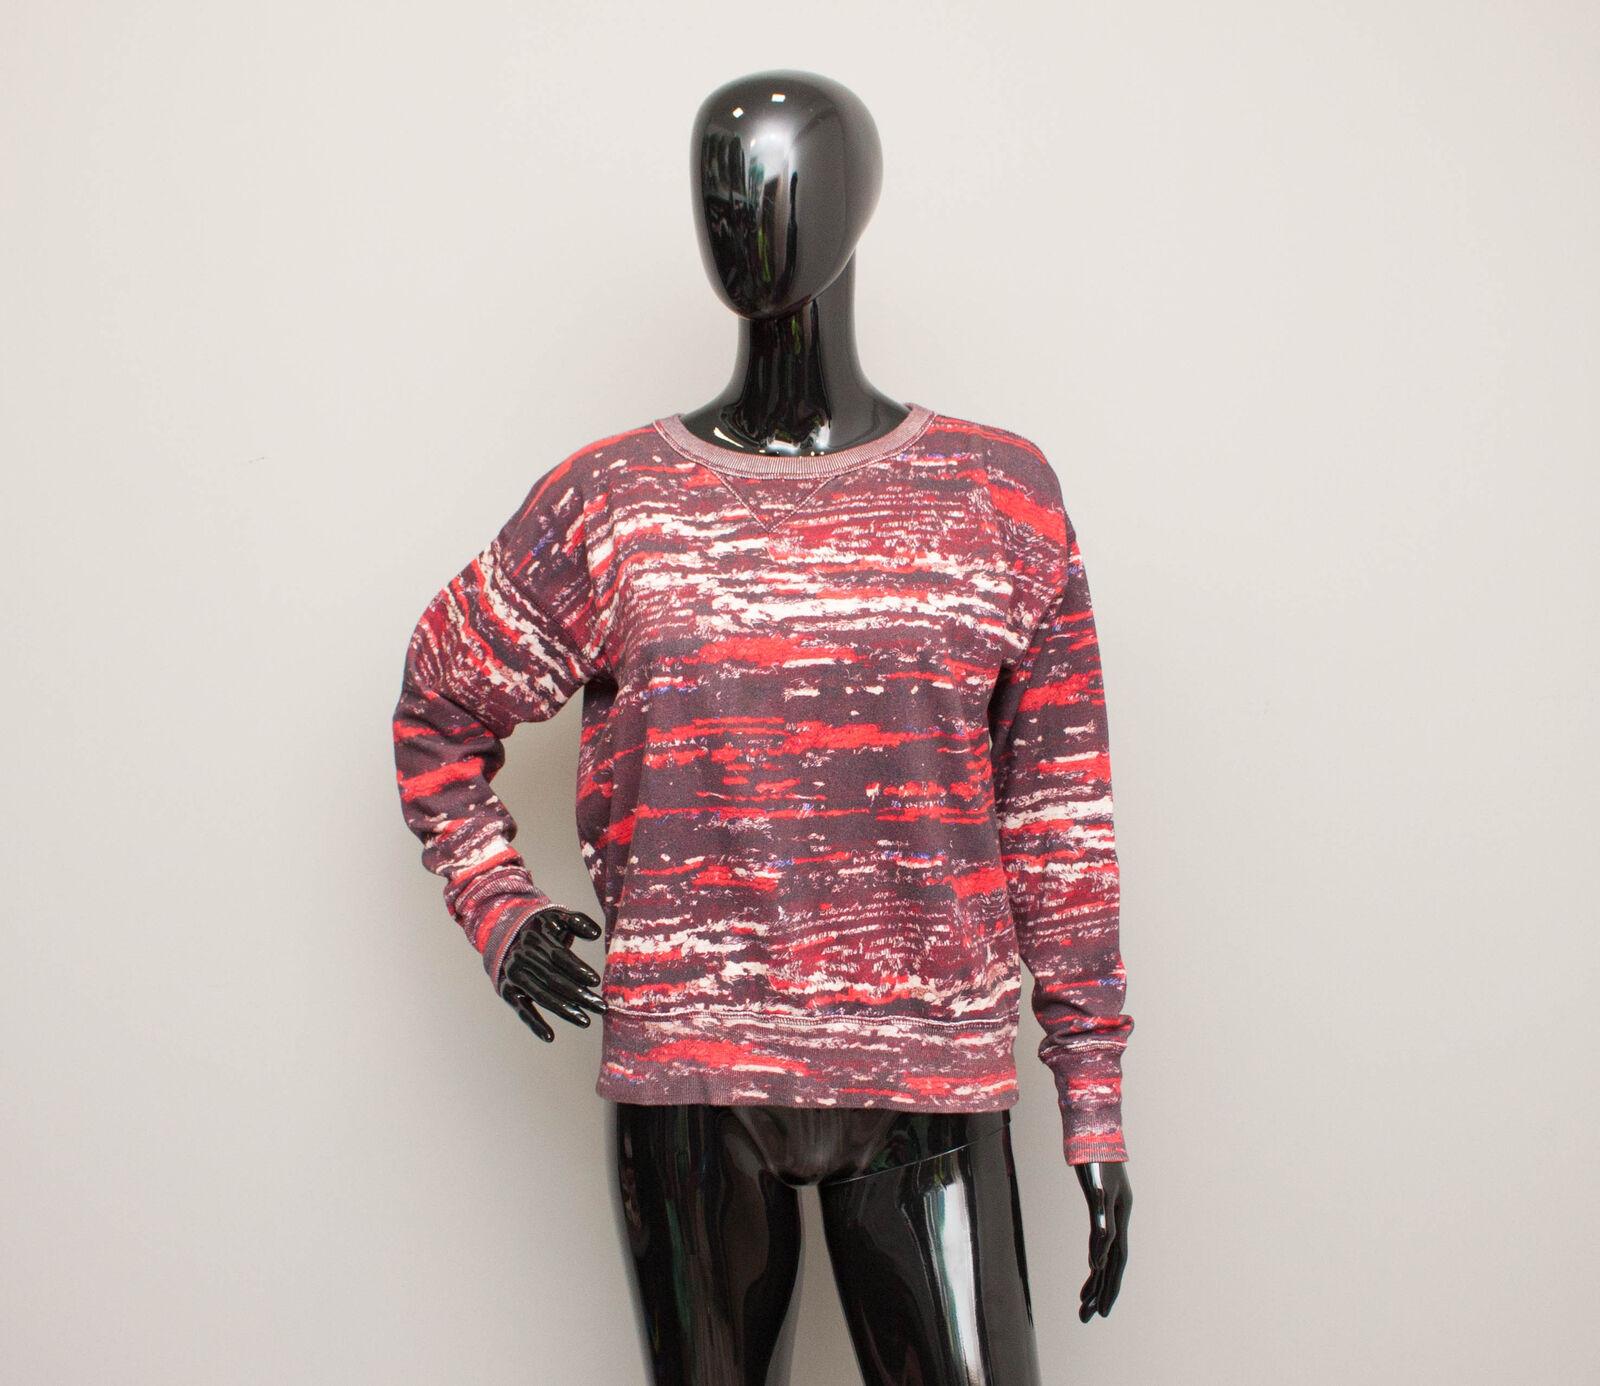 ISABEL MARANT pour H&M Sweatshirt Top Red Print size size size 38 255711